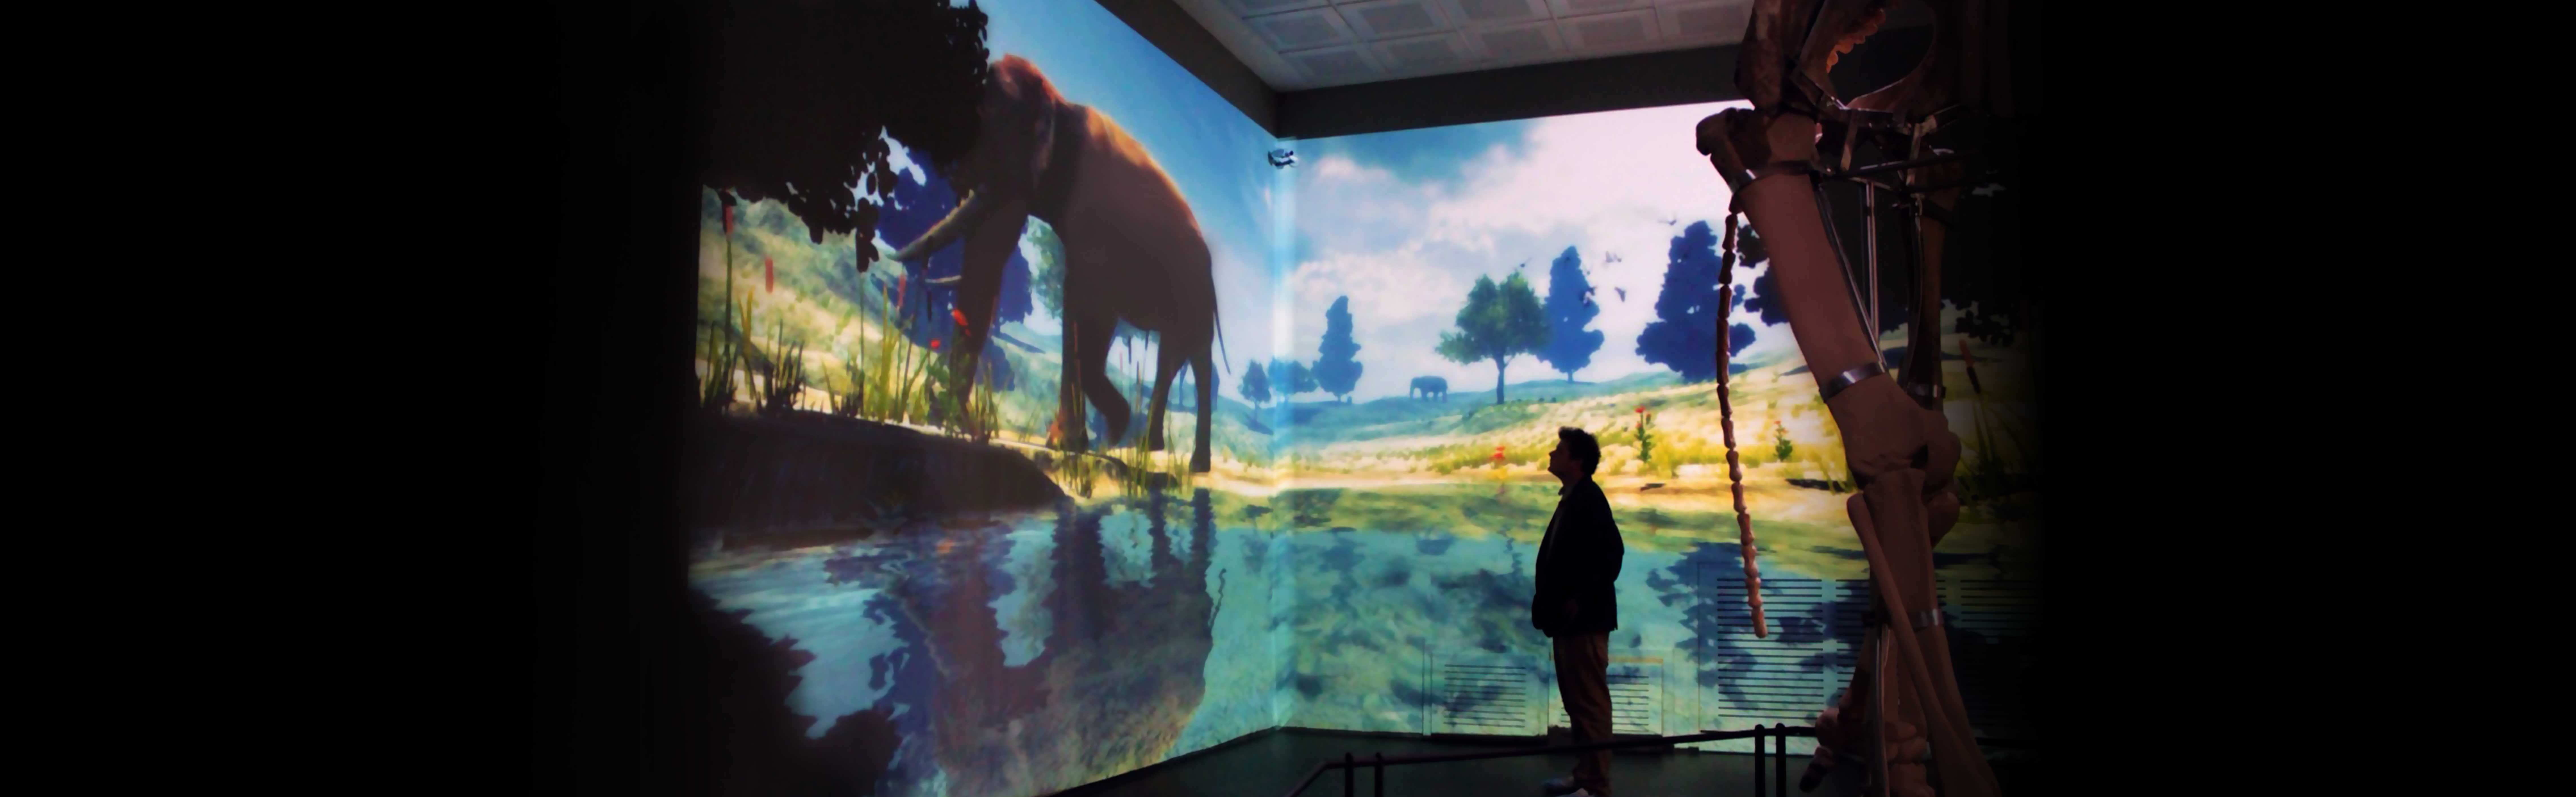 Virtual Simulation Maras Elephant